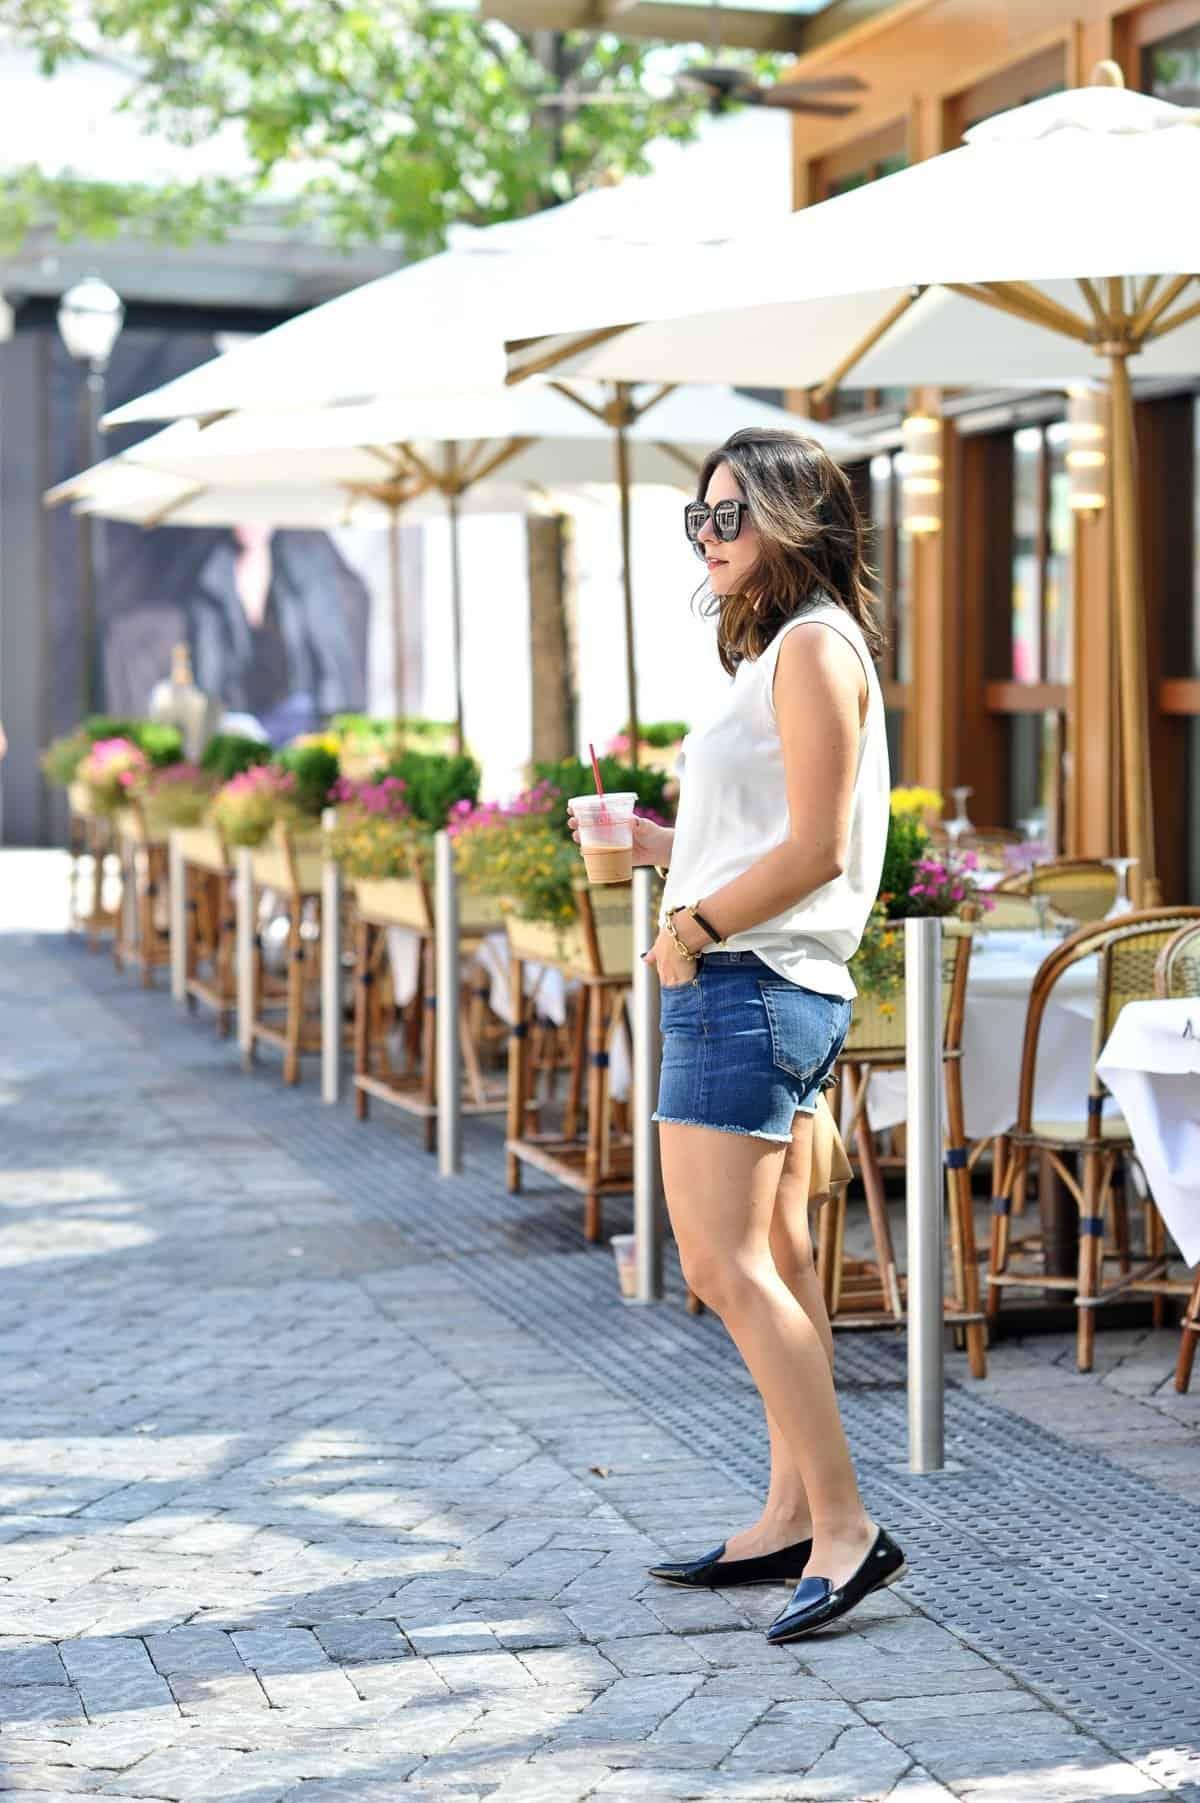 sole society cammila loafer and white button down via @mystylevita [My Style Vita]